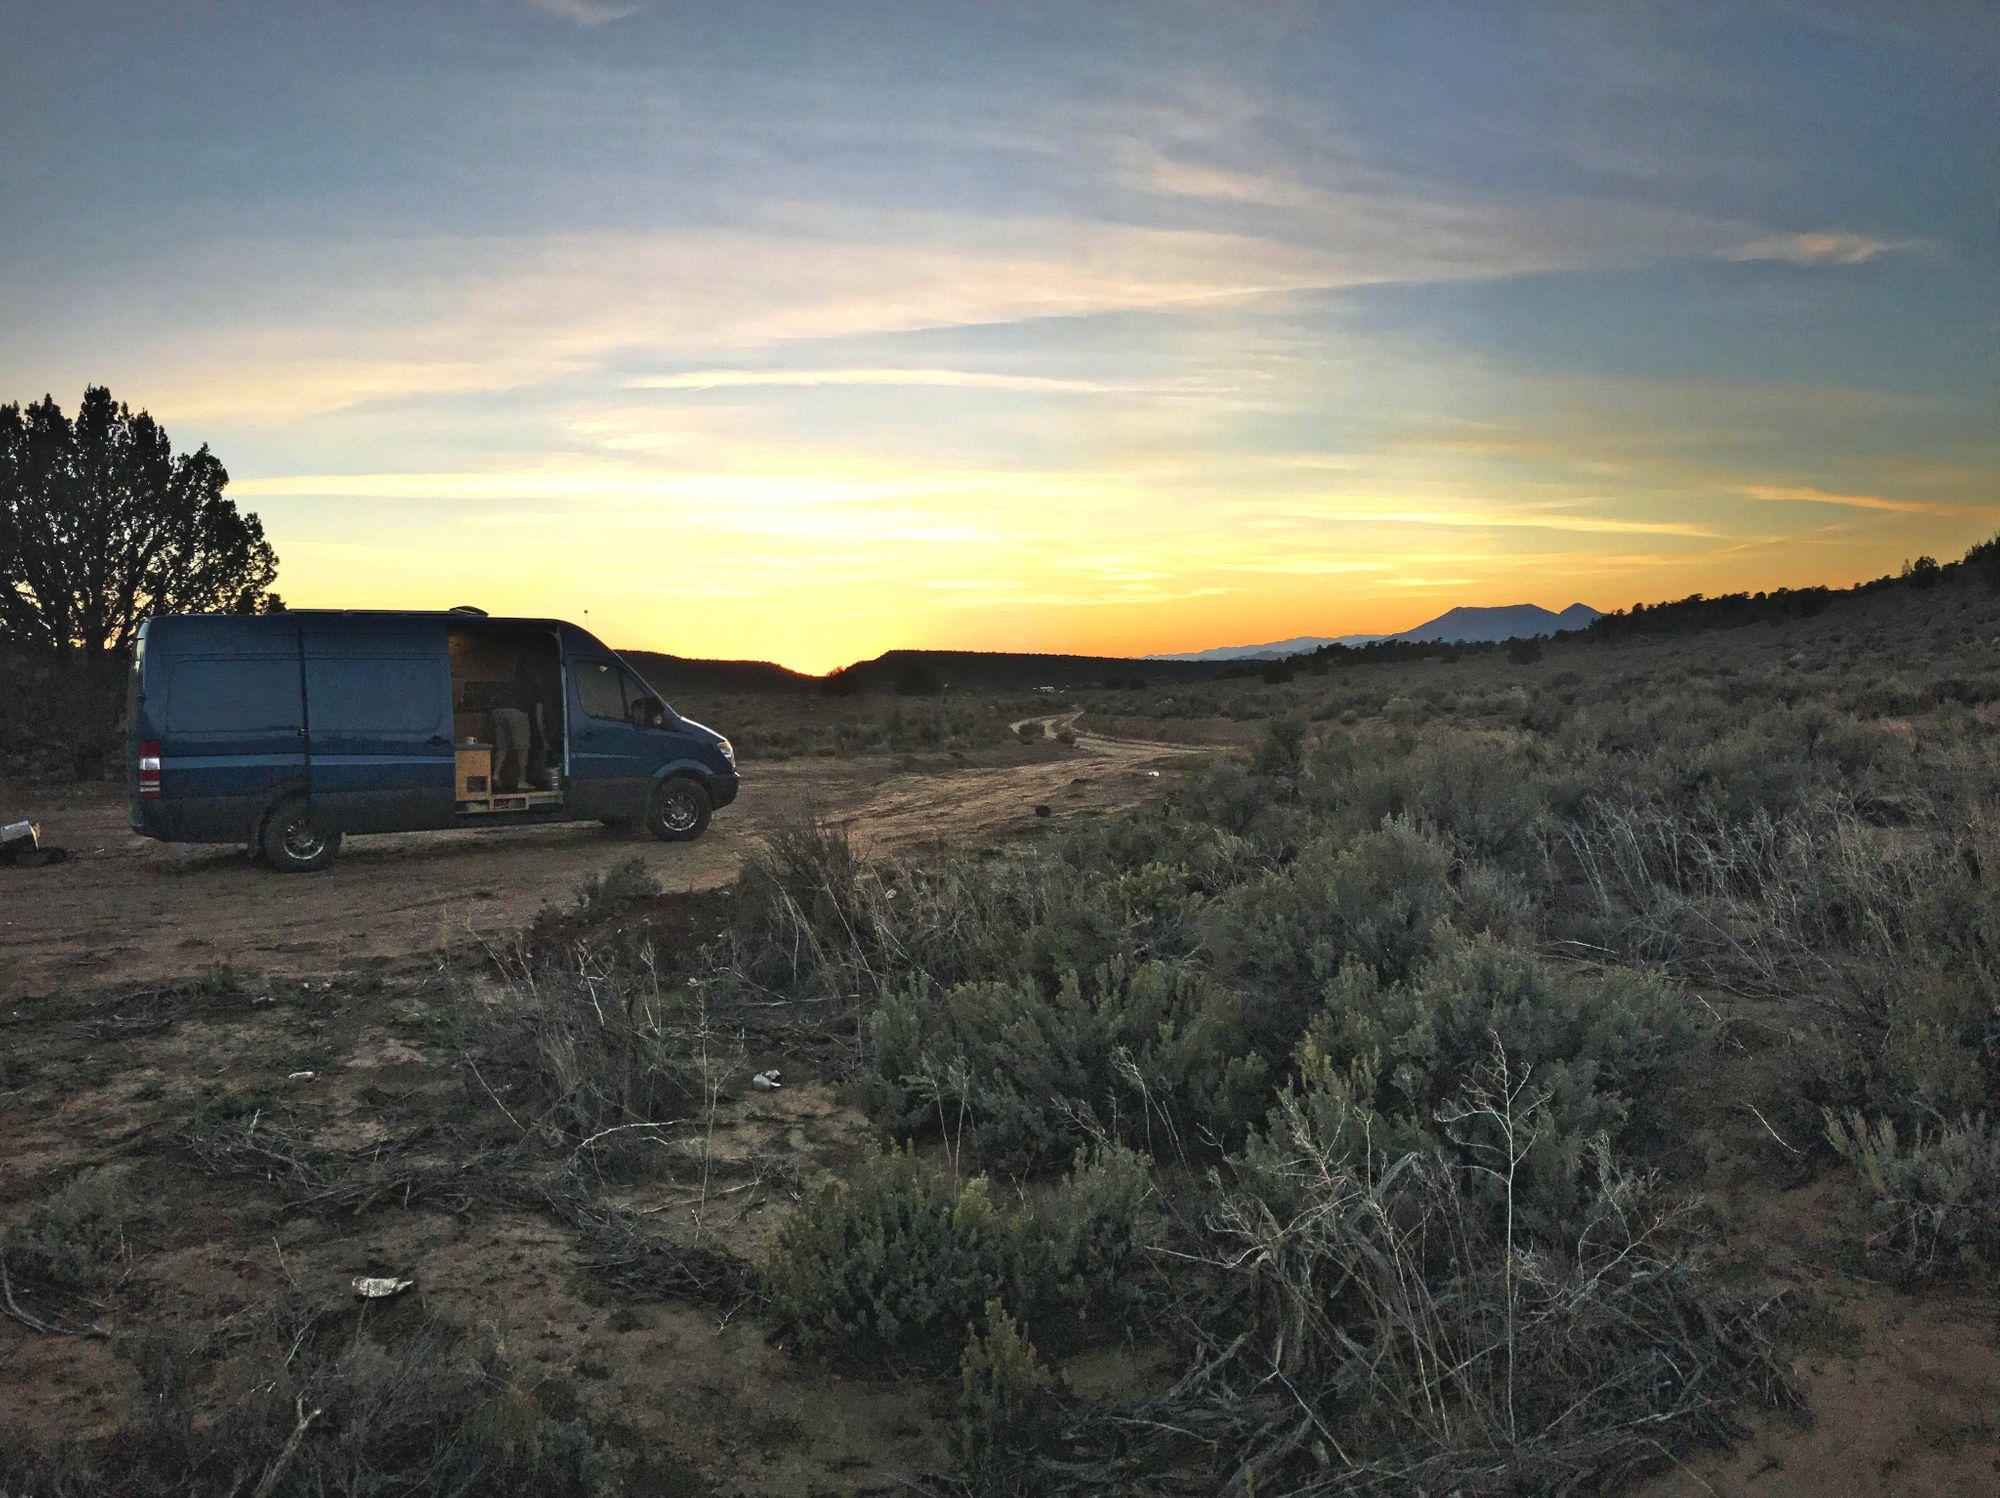 Free camping near St Utah Free camping, Camping